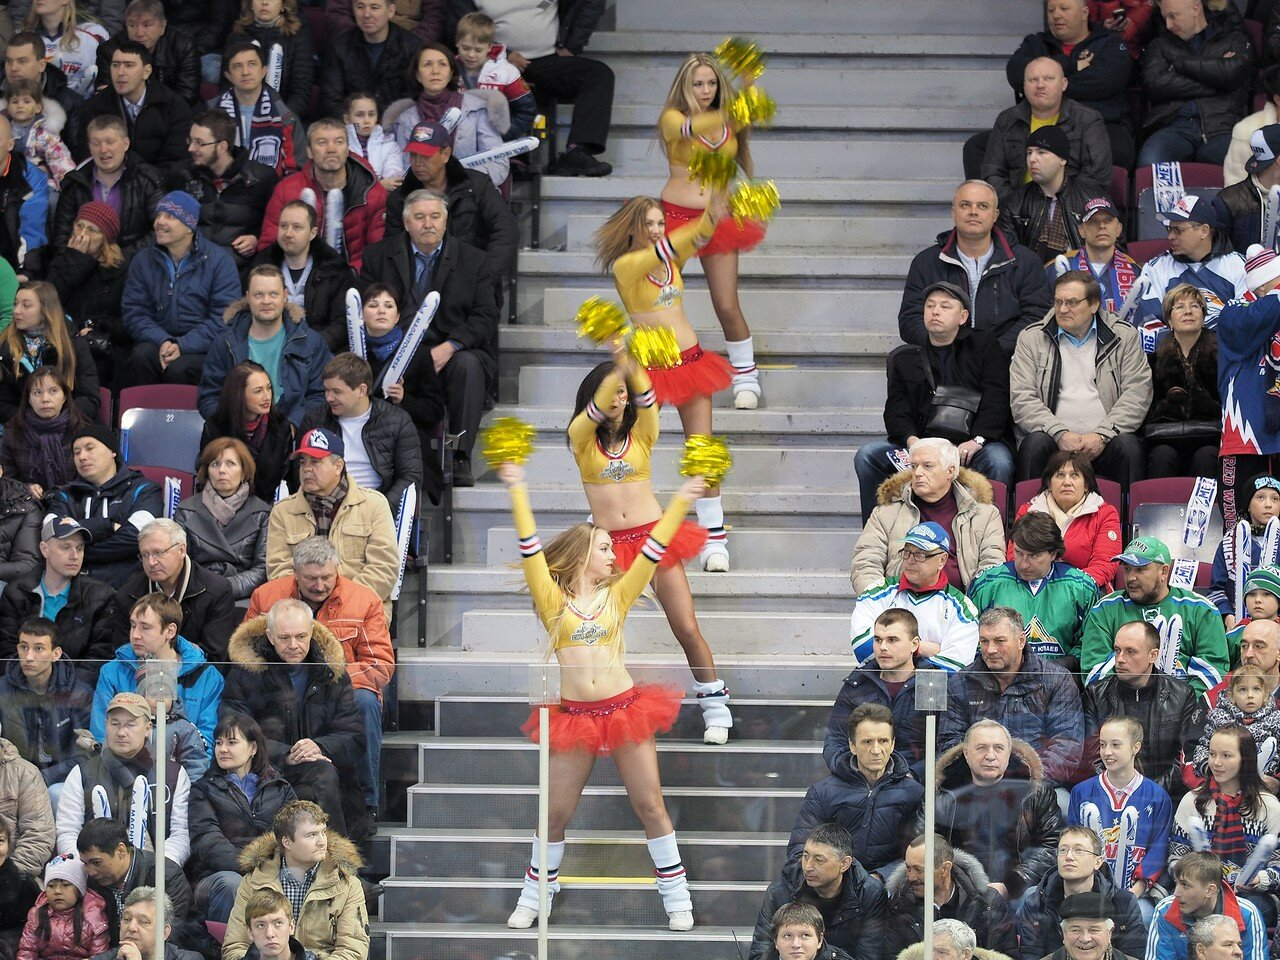 77Плей-офф 2016 Восток Финал Металлург - Салават Юлаев 23.03.2016